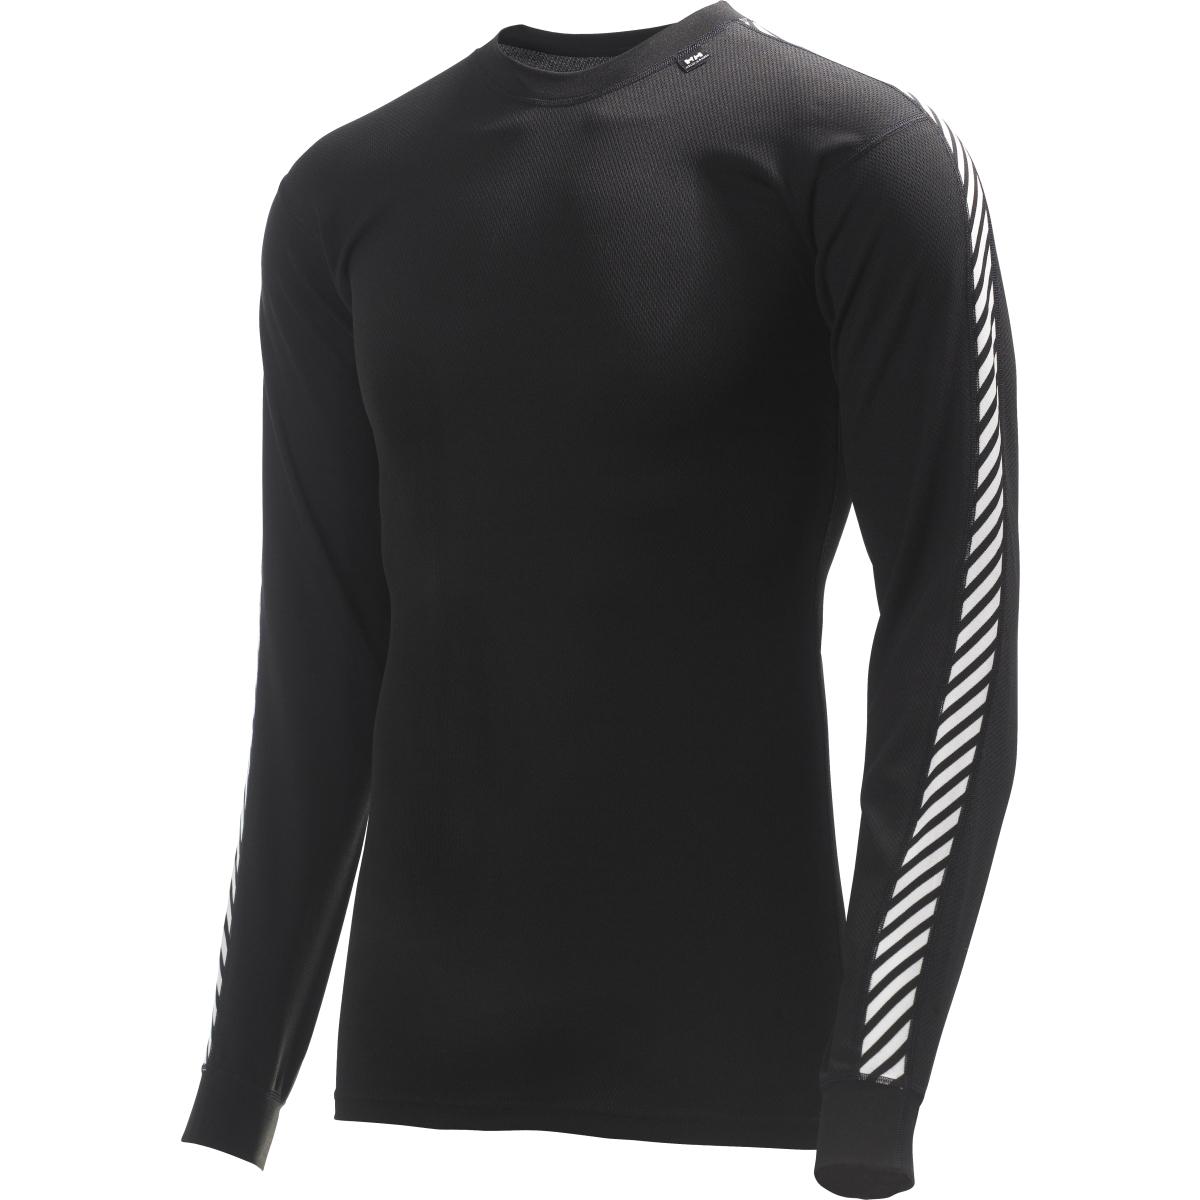 [check Price] Store Locator Sport Chek Δ